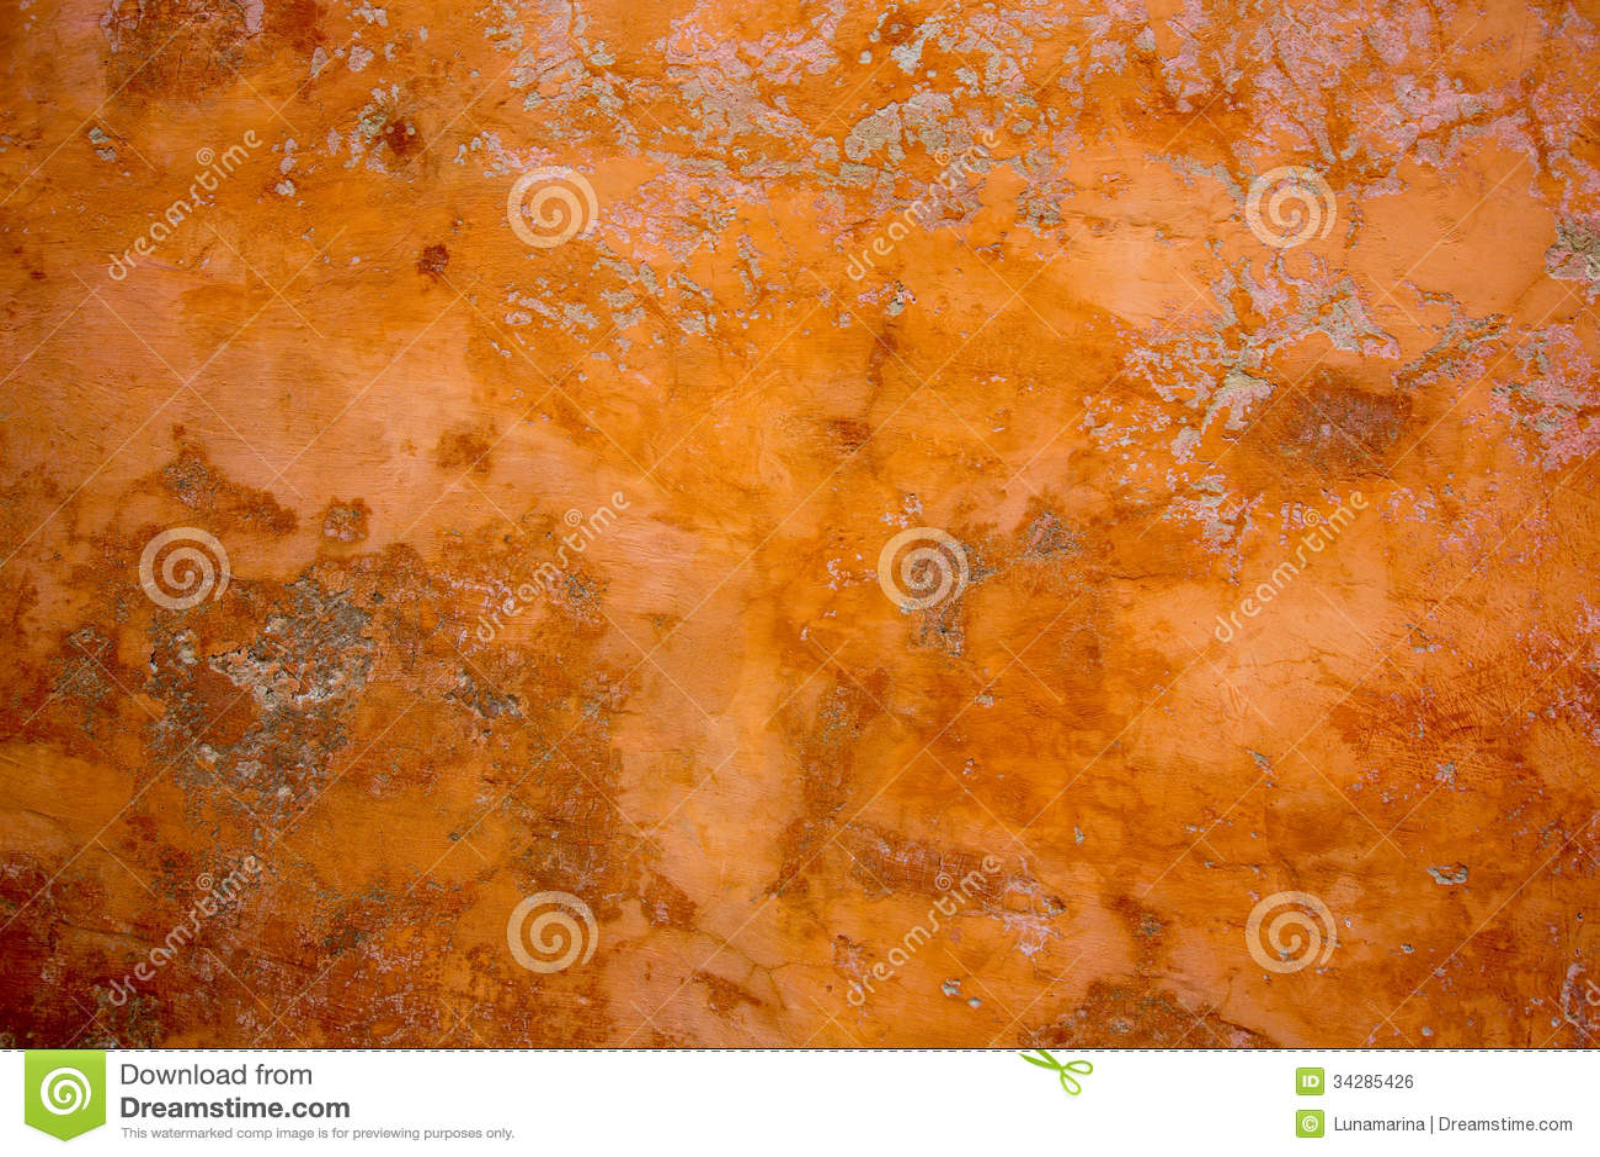 Orange Cement Wall : Ibiza mediterranean wall textures in orange concrete